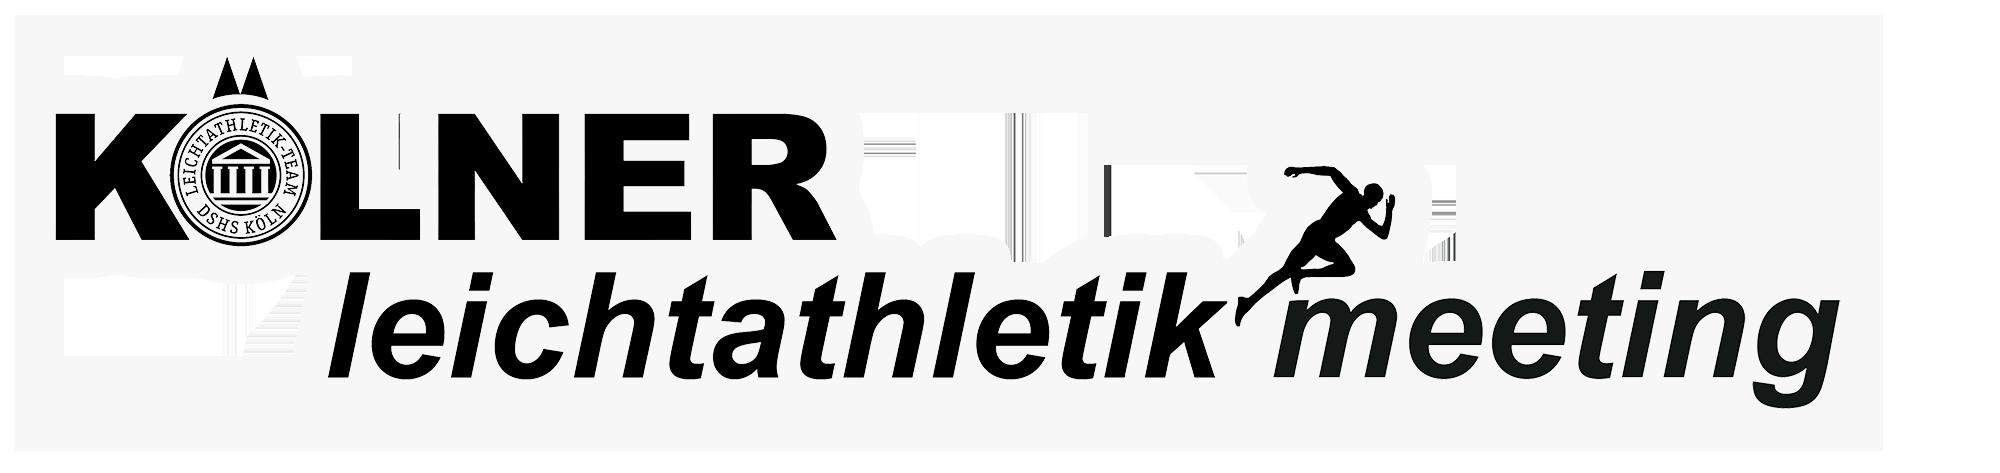 2. Kölner Leichtathletikmeeting – Samstag, 04. August 2018